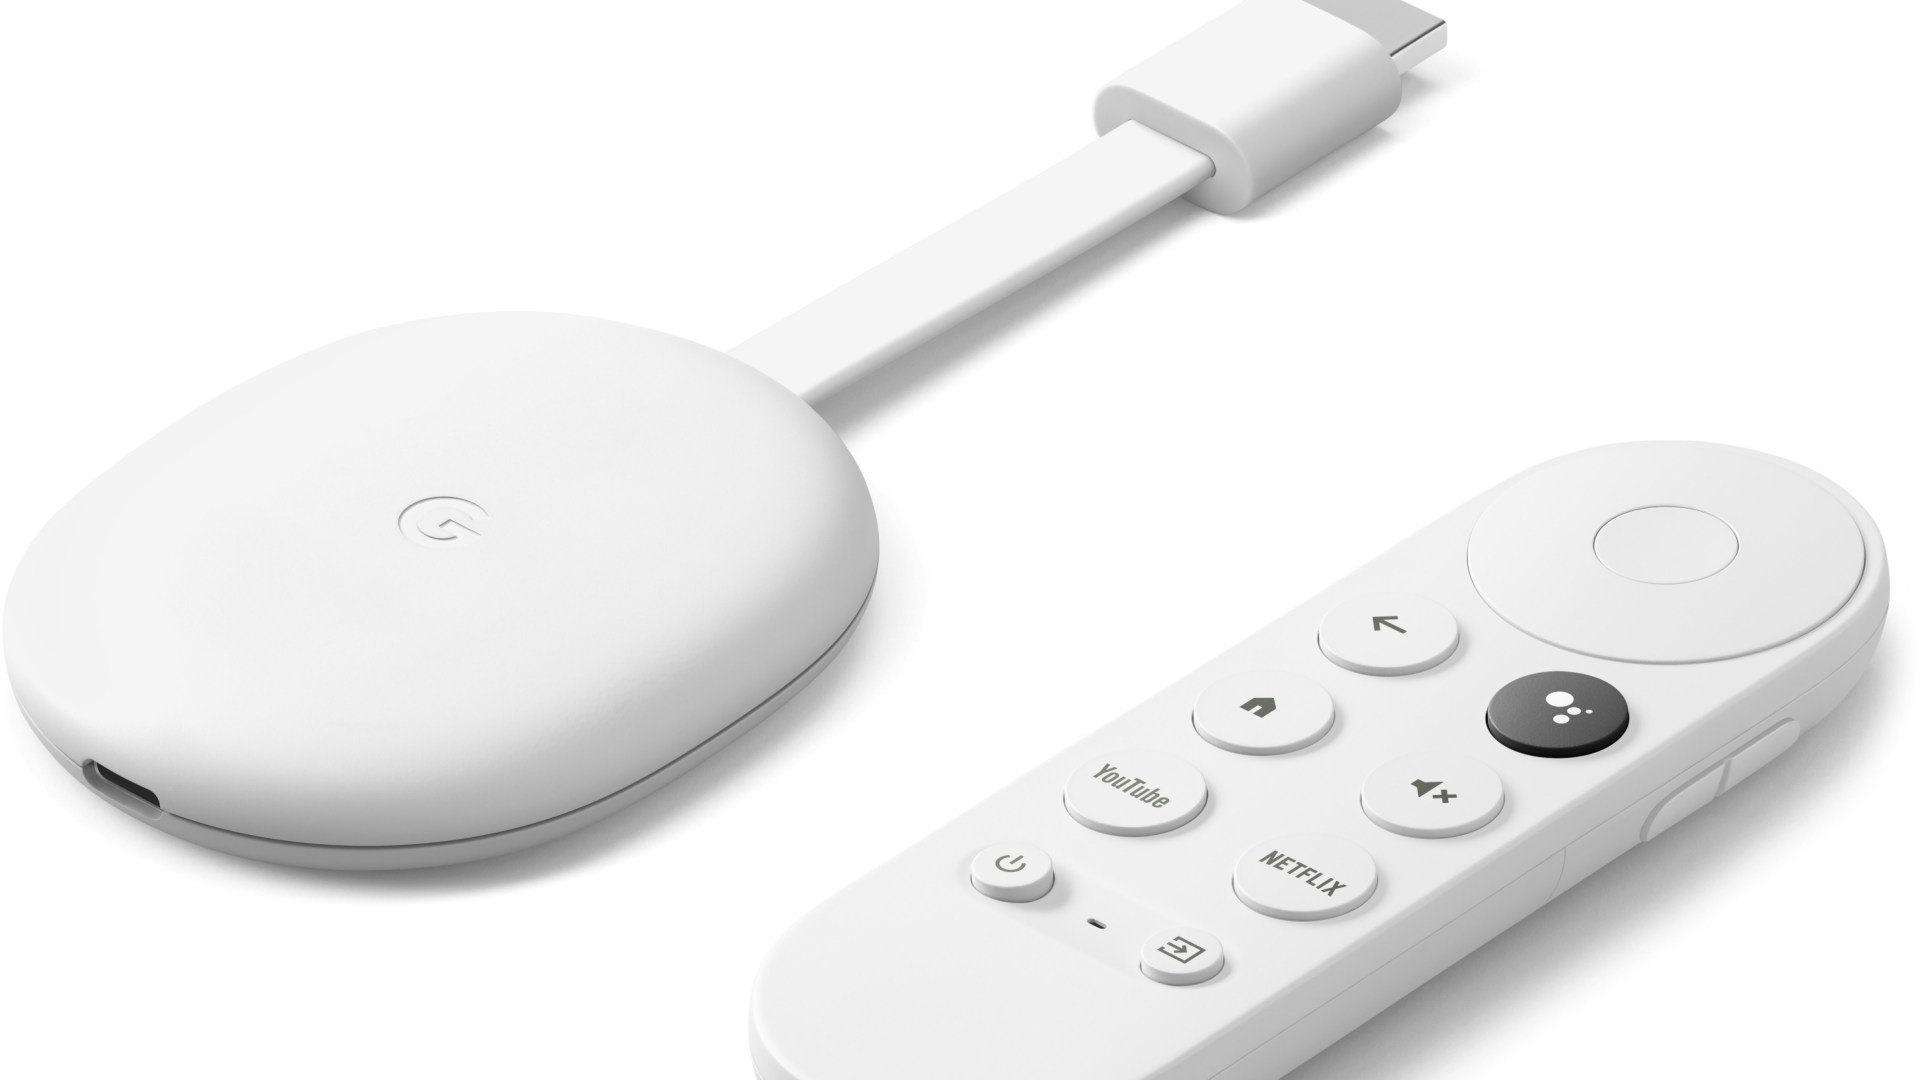 Streaming, Hdmi, chromecast, Google Tv, Dongle, Google ChromeCast, Chromecast with Google TV